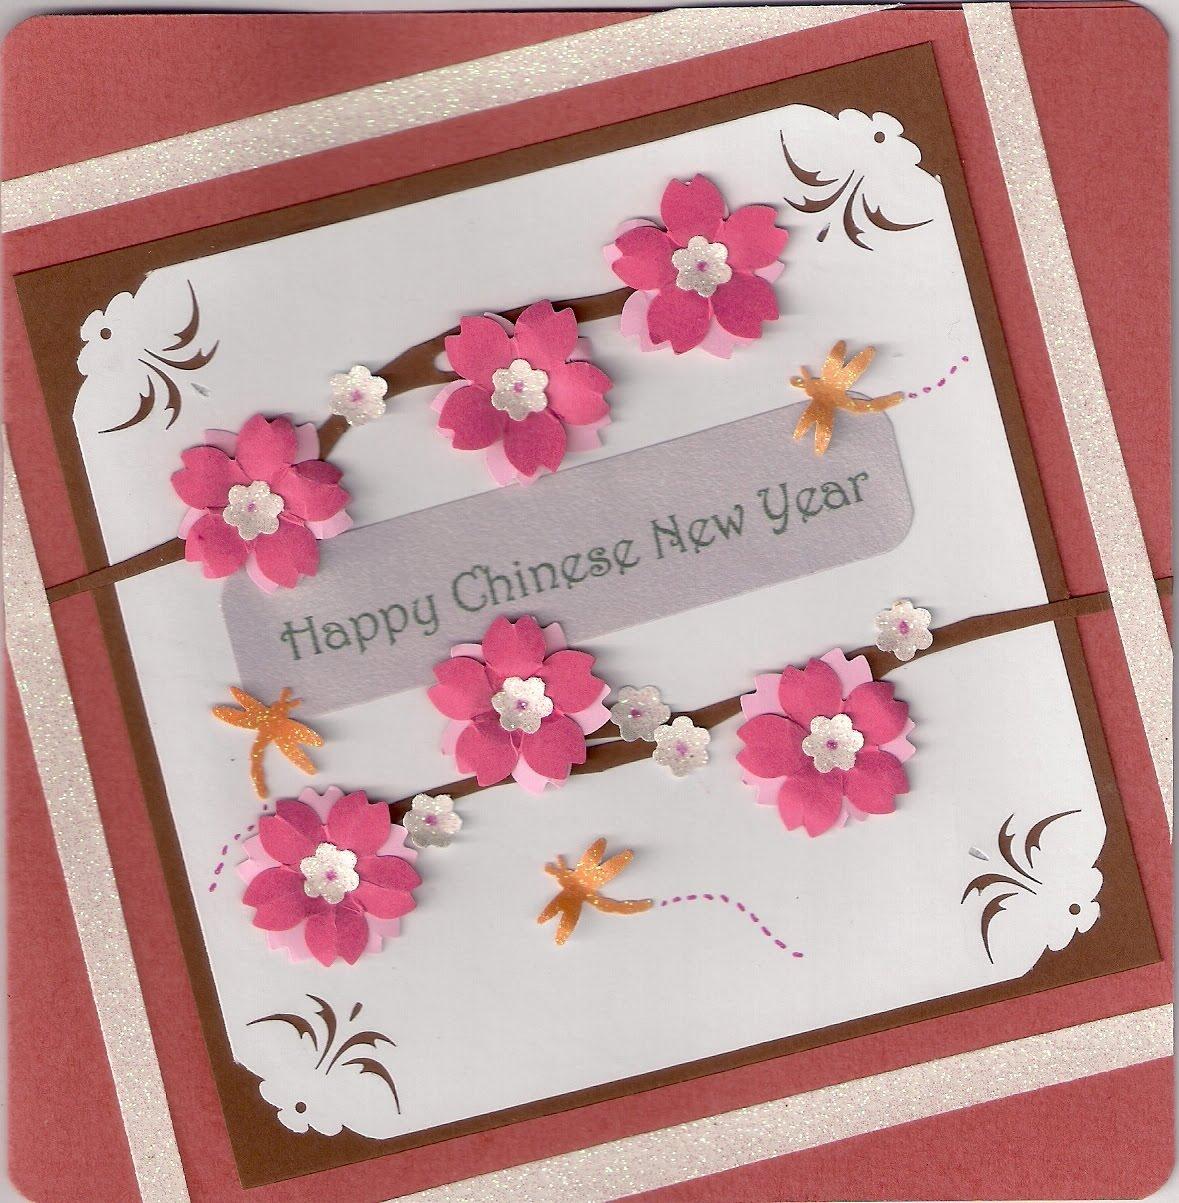 Christie Craft Happy Chinese New Year 2011